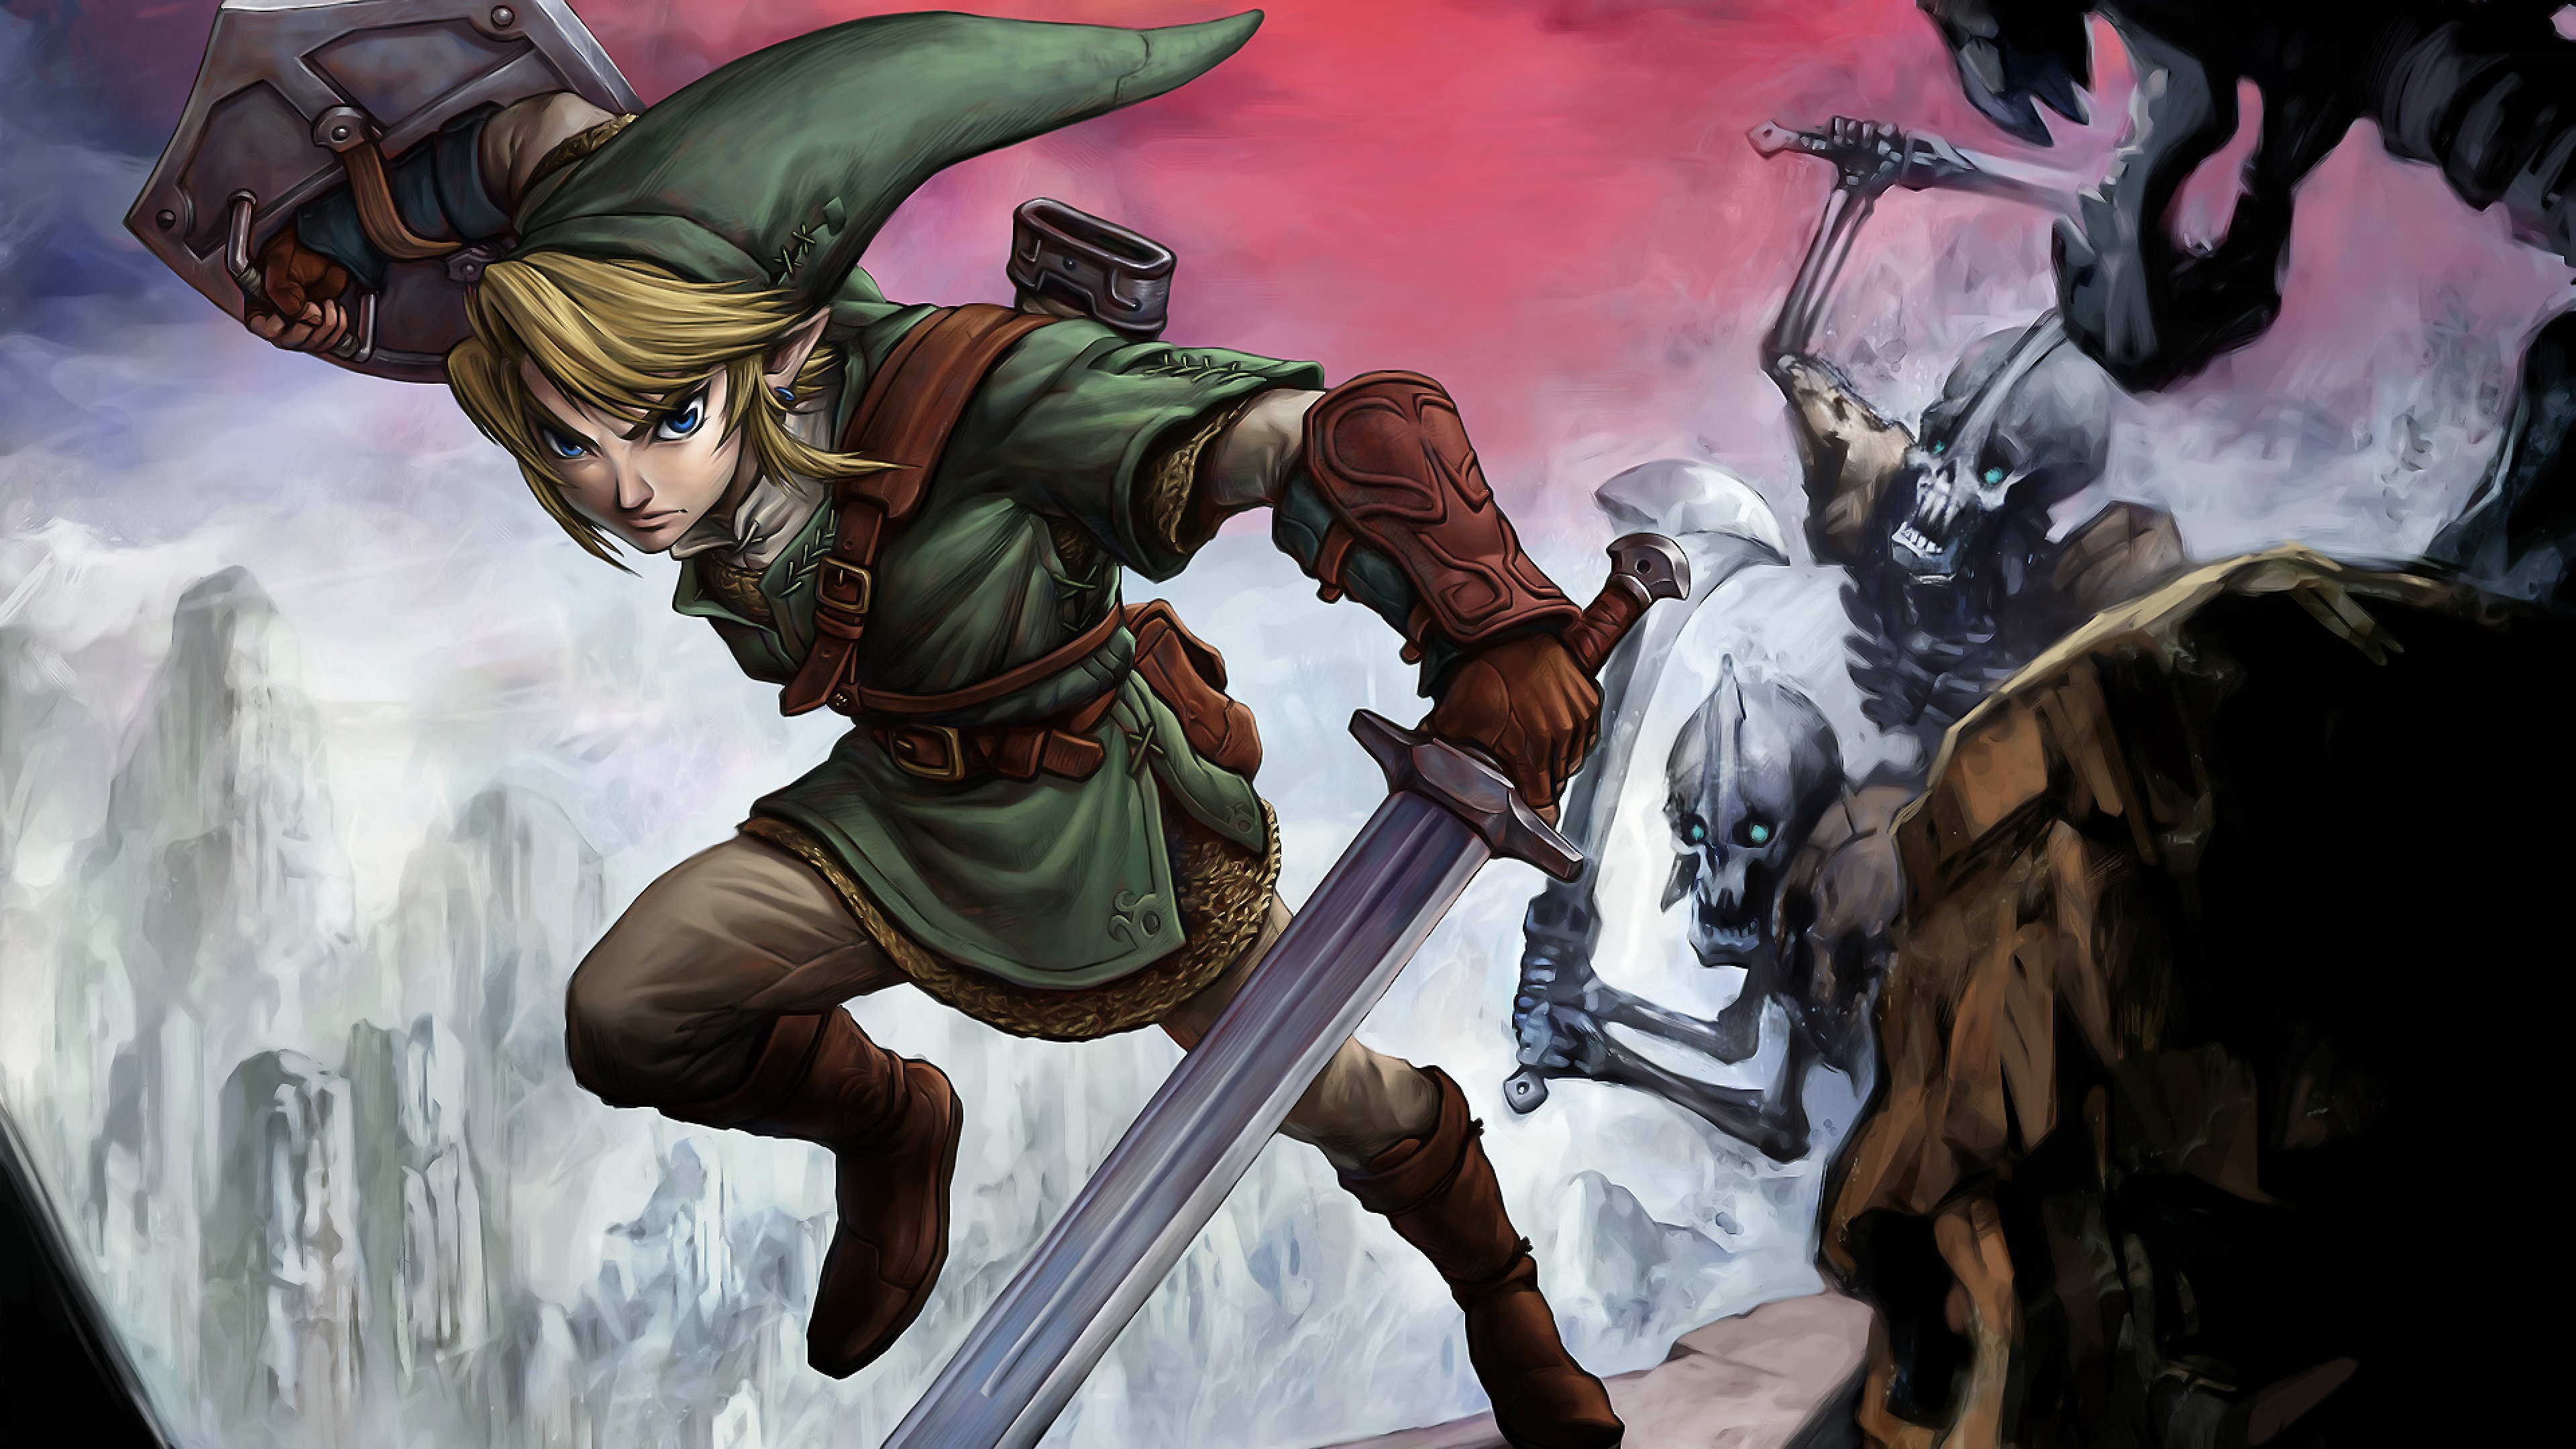 Download Wallpaper 3840x2160 Link Zelda Battle Elf 4K Ultra HD HD 3840x2160